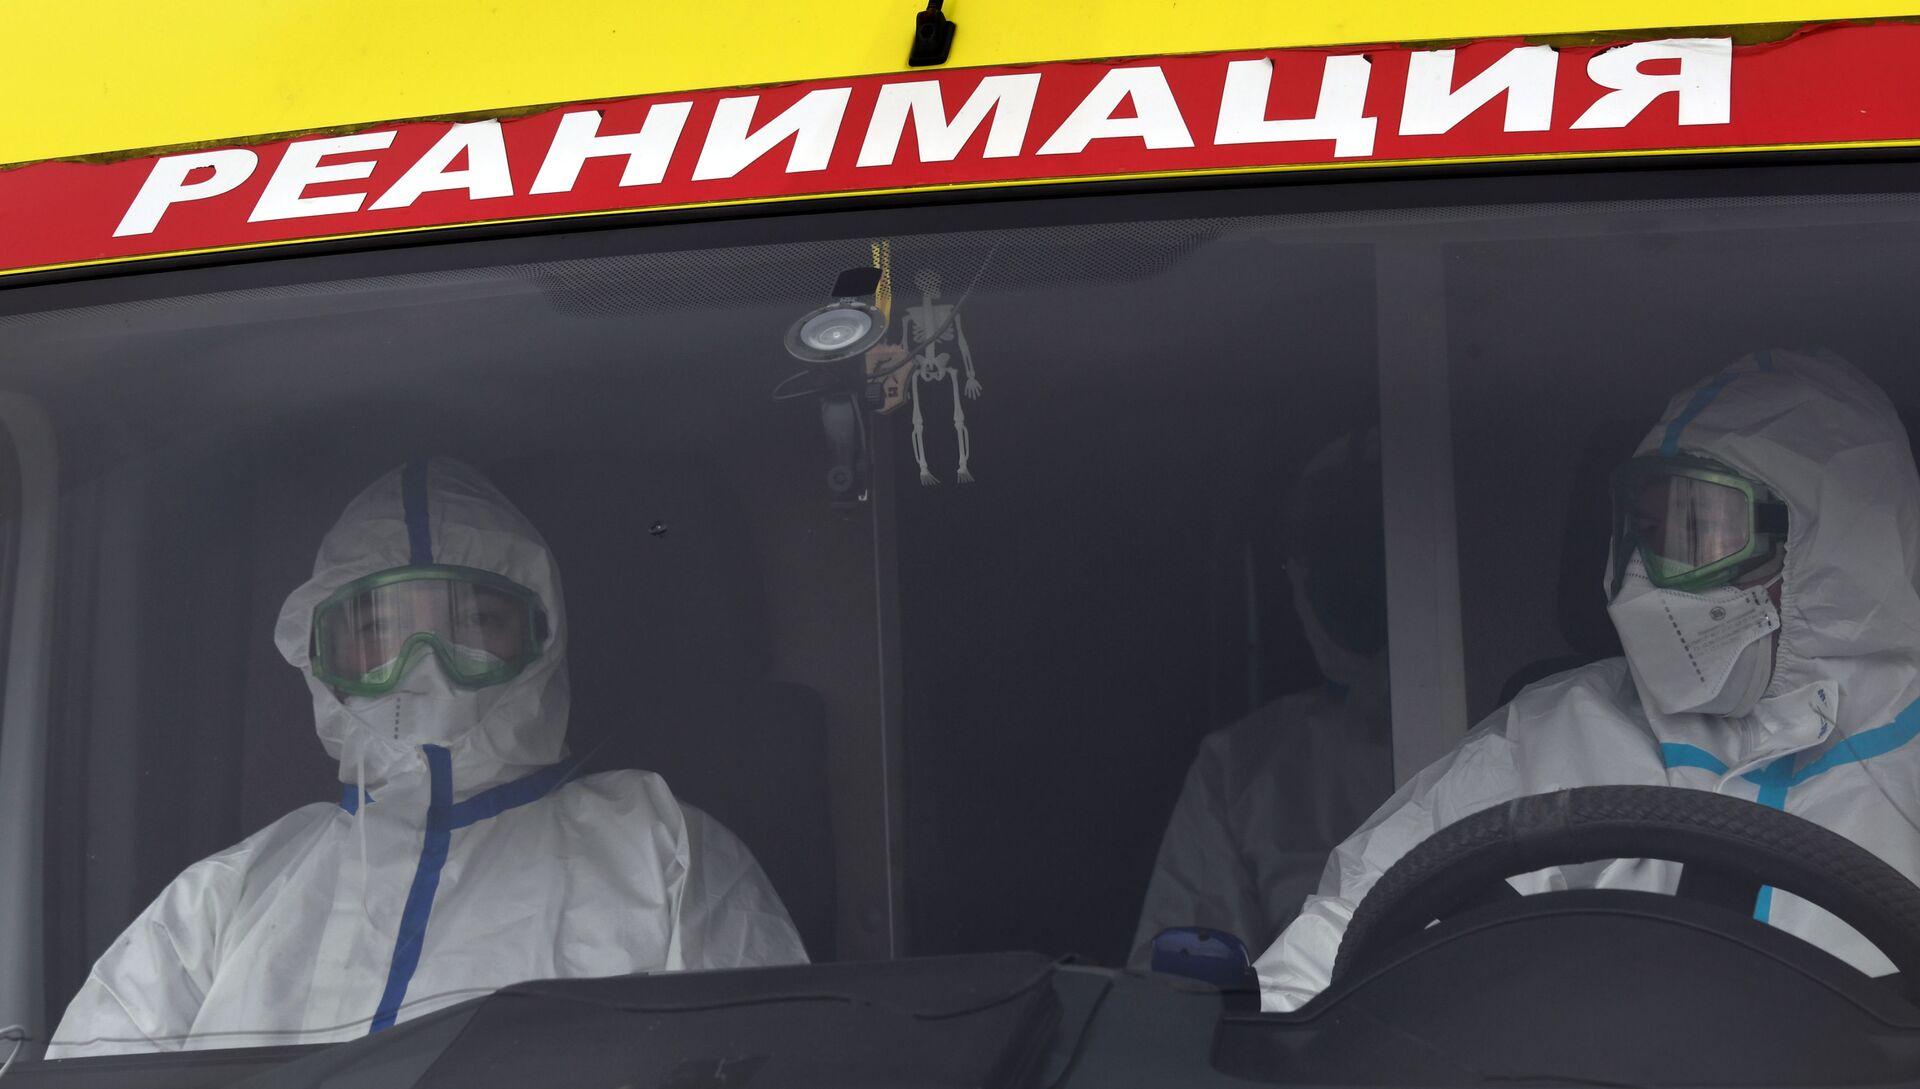 Медицинские работники в автомобиле реанимации - РИА Новости, 1920, 09.11.2020